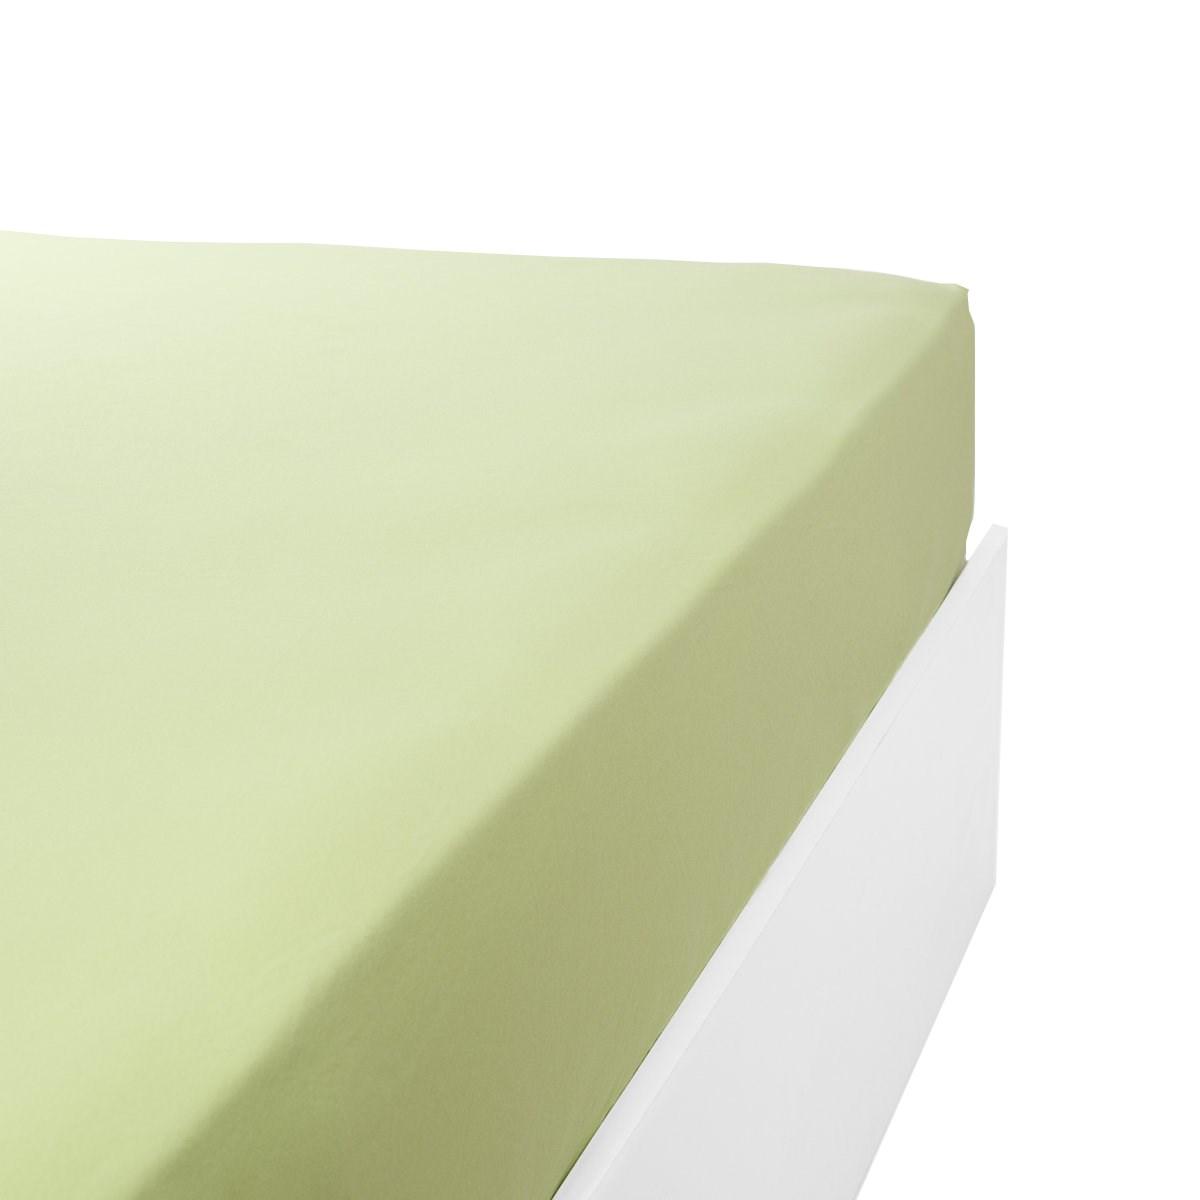 Drap housse flanelle en Molleton Vert anis 140x190 cm